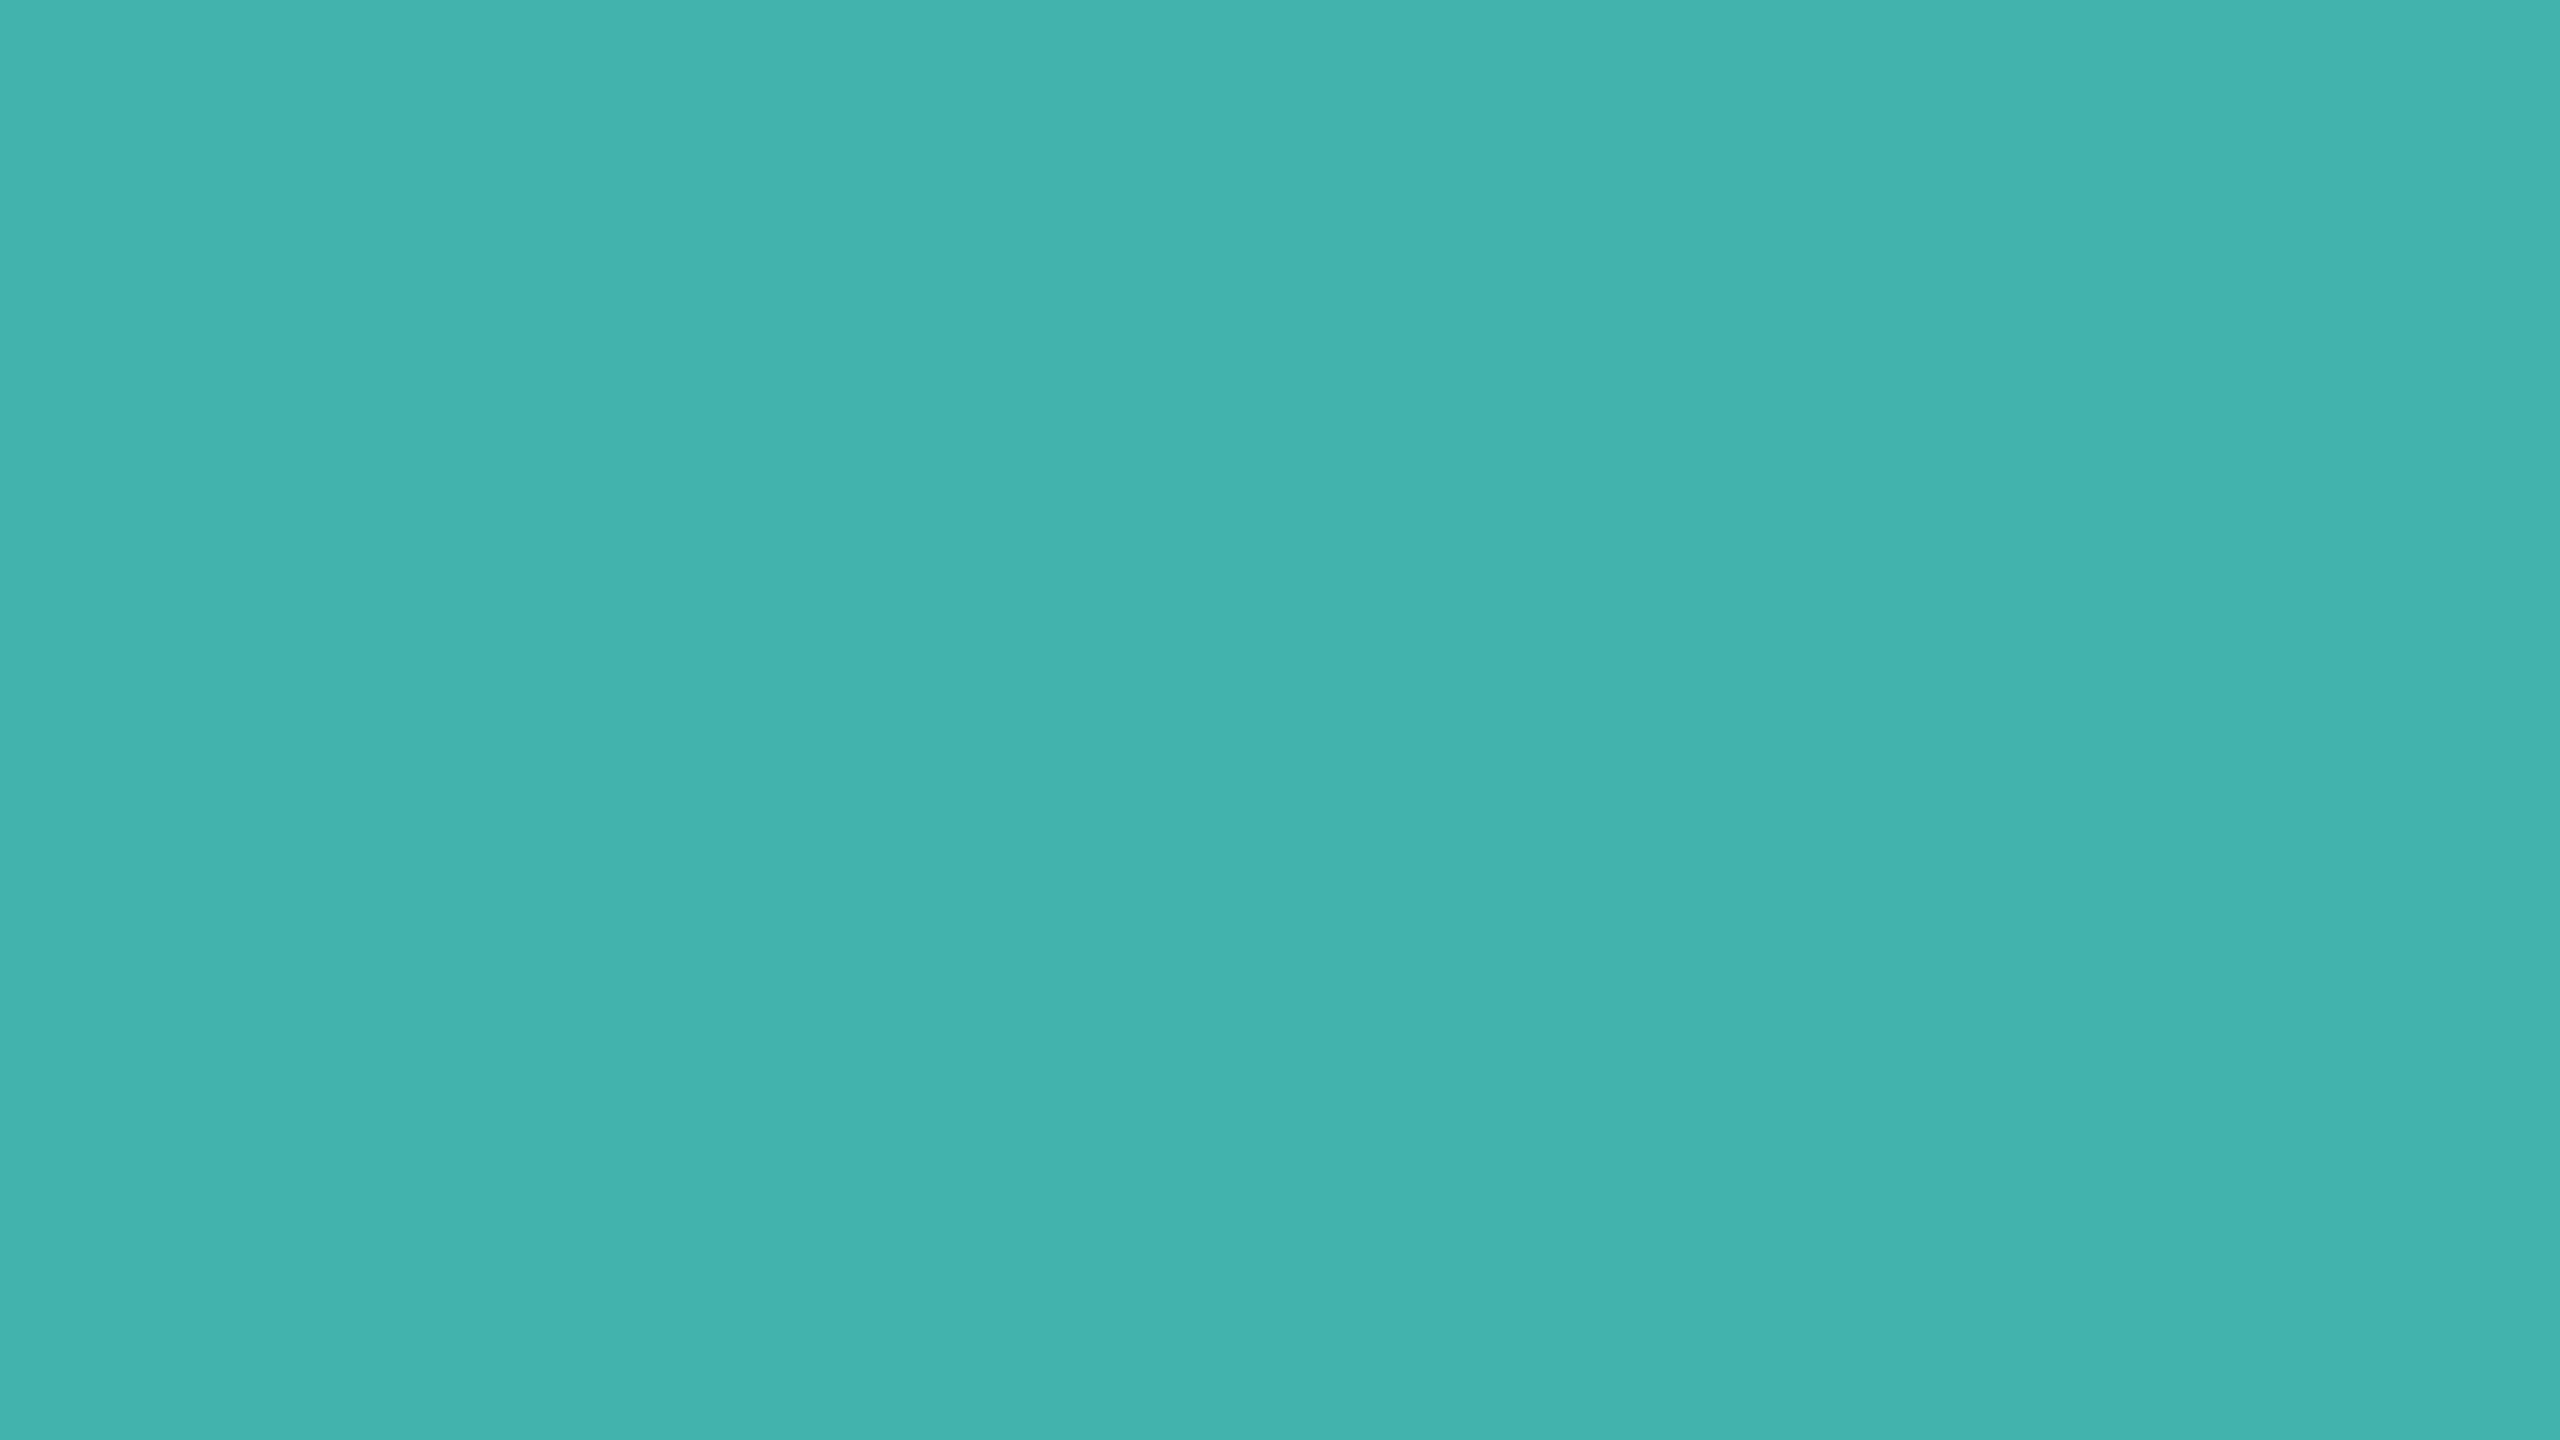 2560x1440 Verdigris Solid Color Background